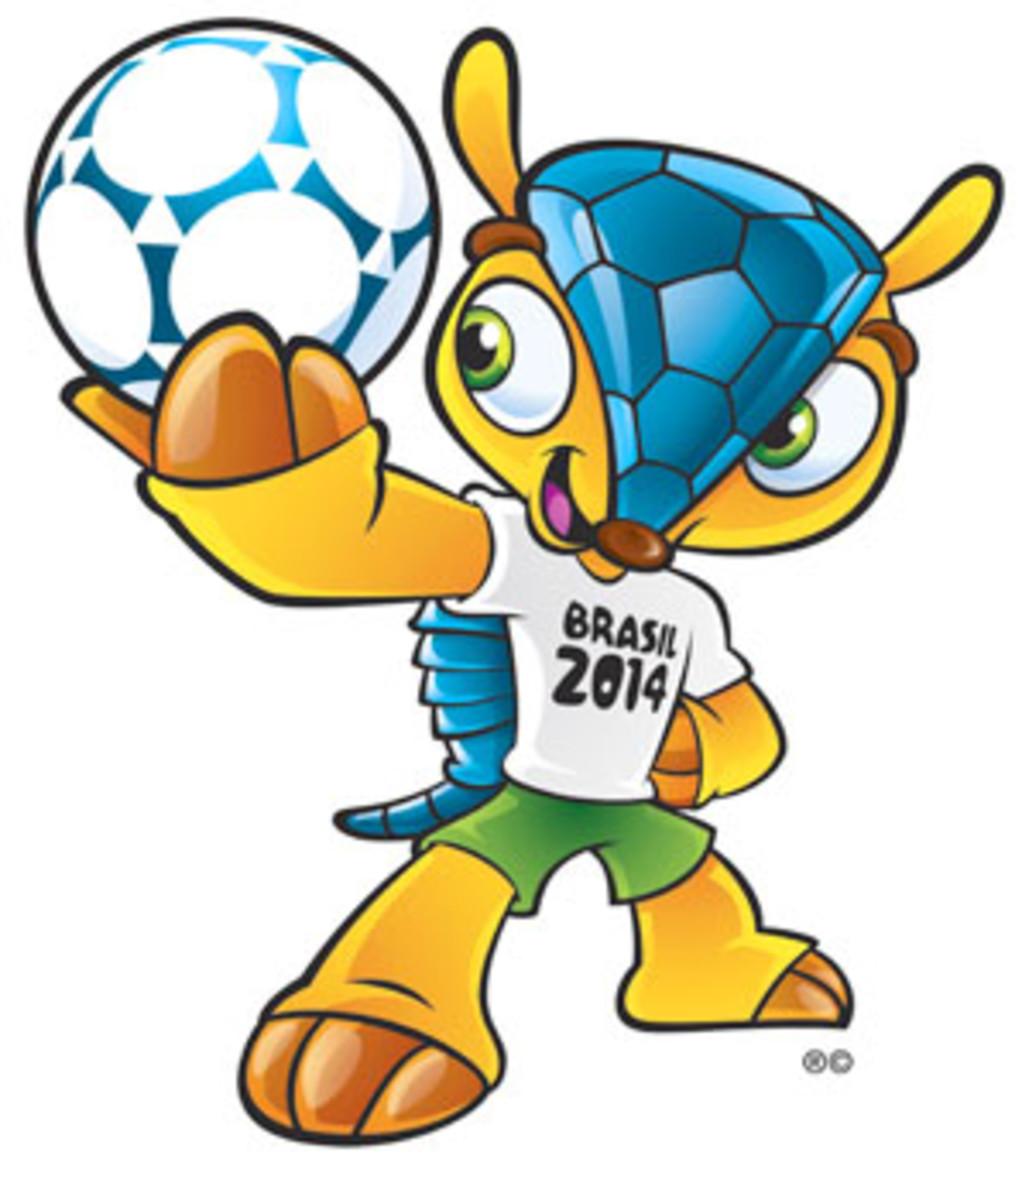 brazil-mascot-reuters.jpg